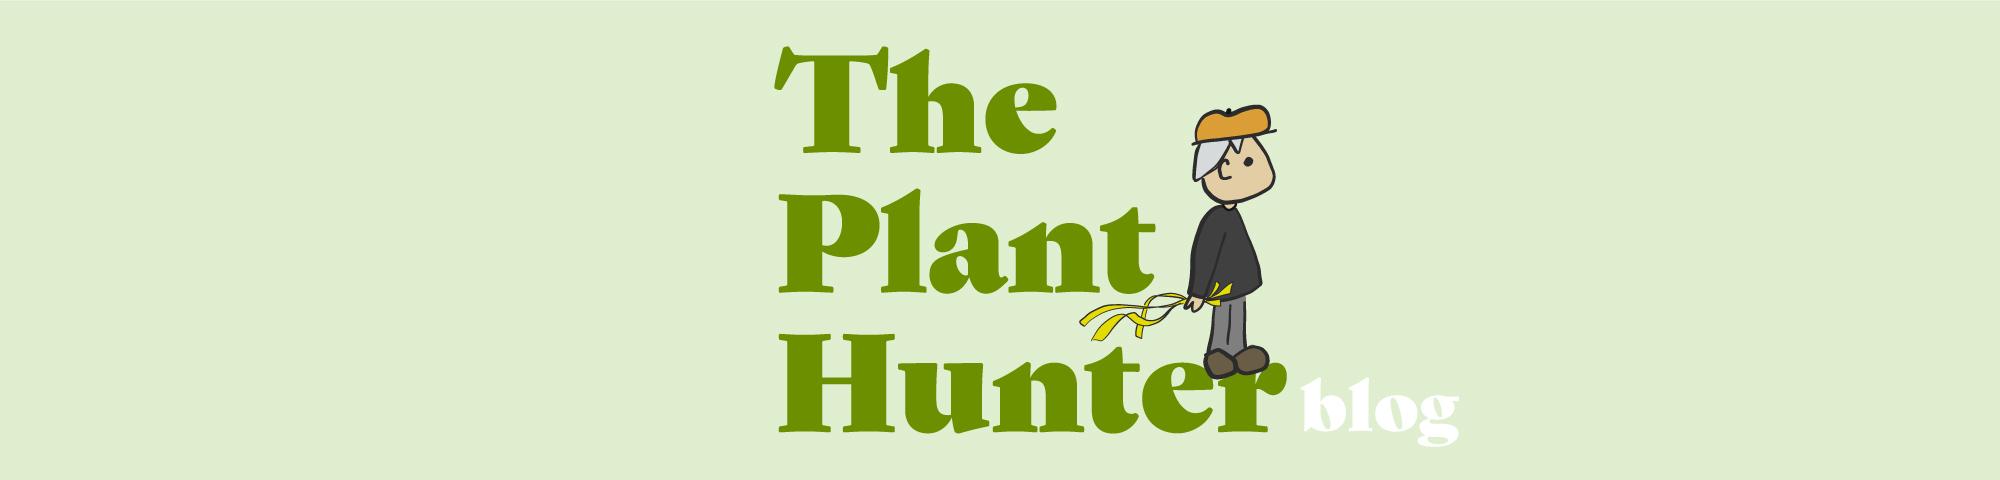 theplanthunter.jpg